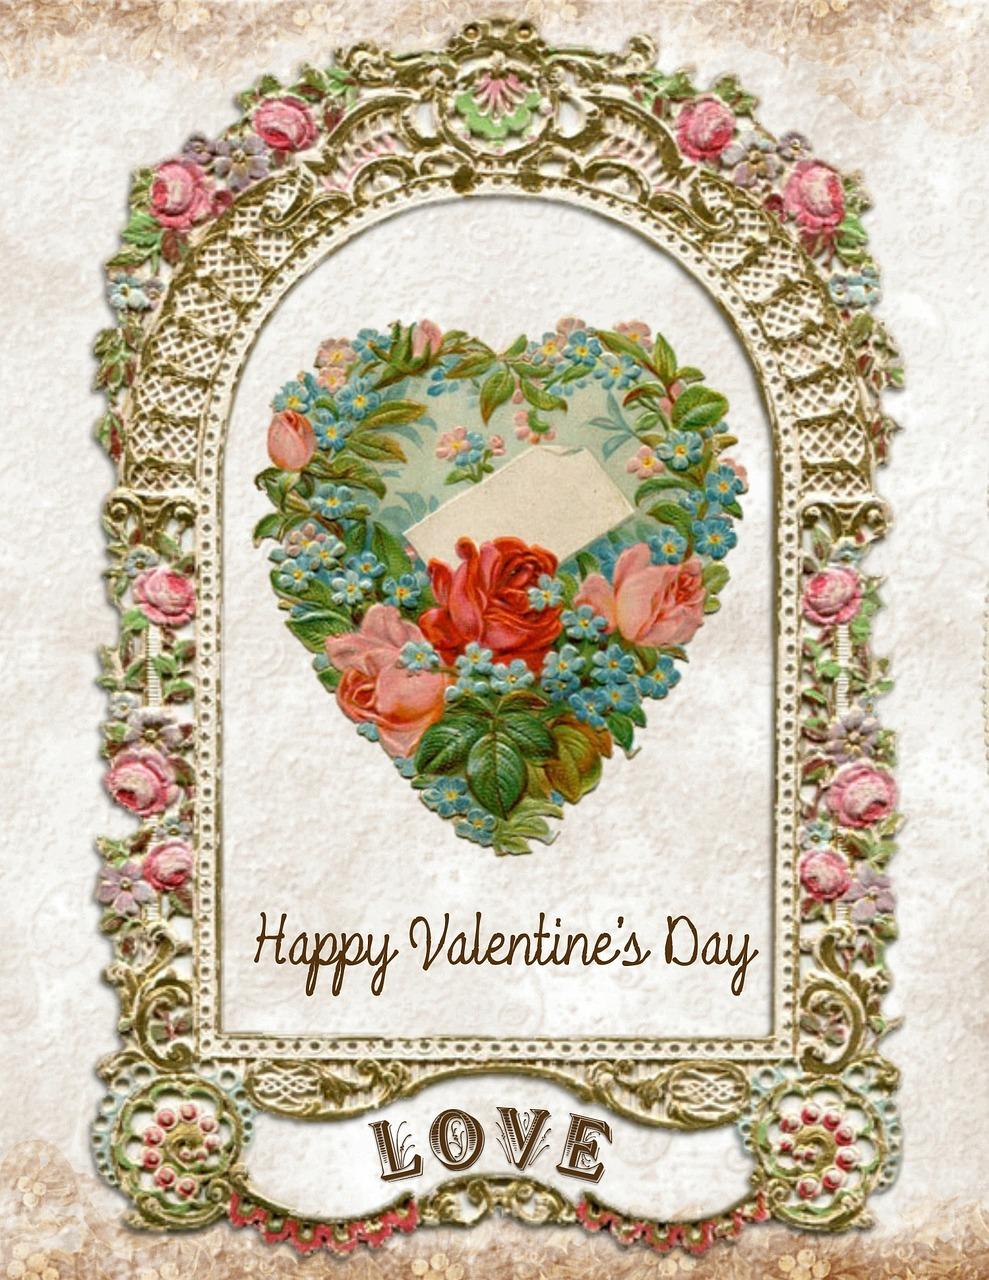 Valentine S Day Love Valentine Card Ornate Free Photo From Needpix Com